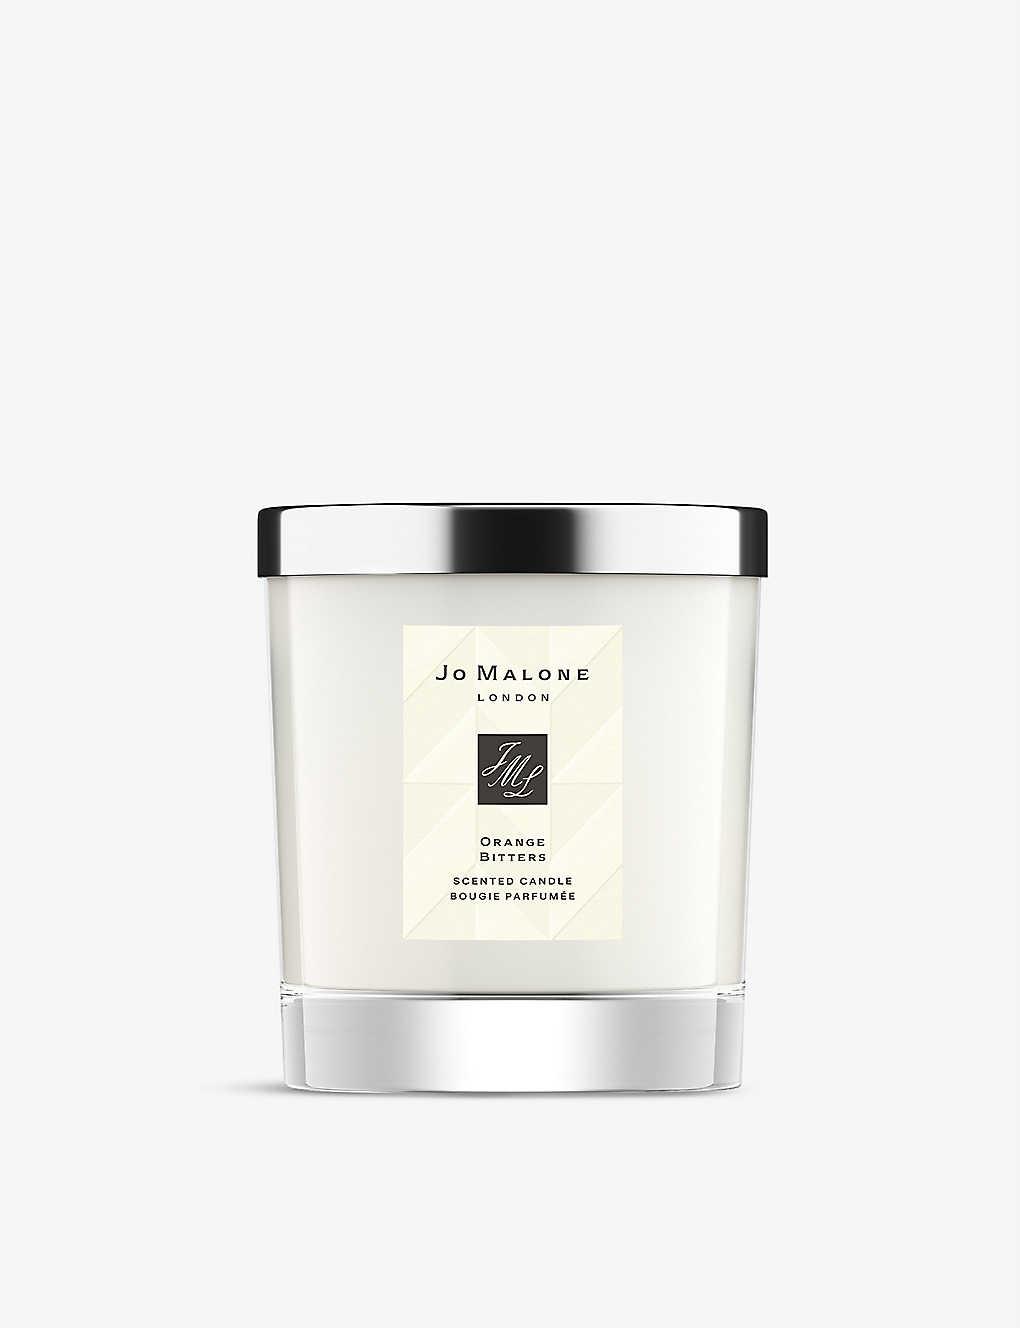 JO MALONE LONDON: Orange Bitters scented candle 200g